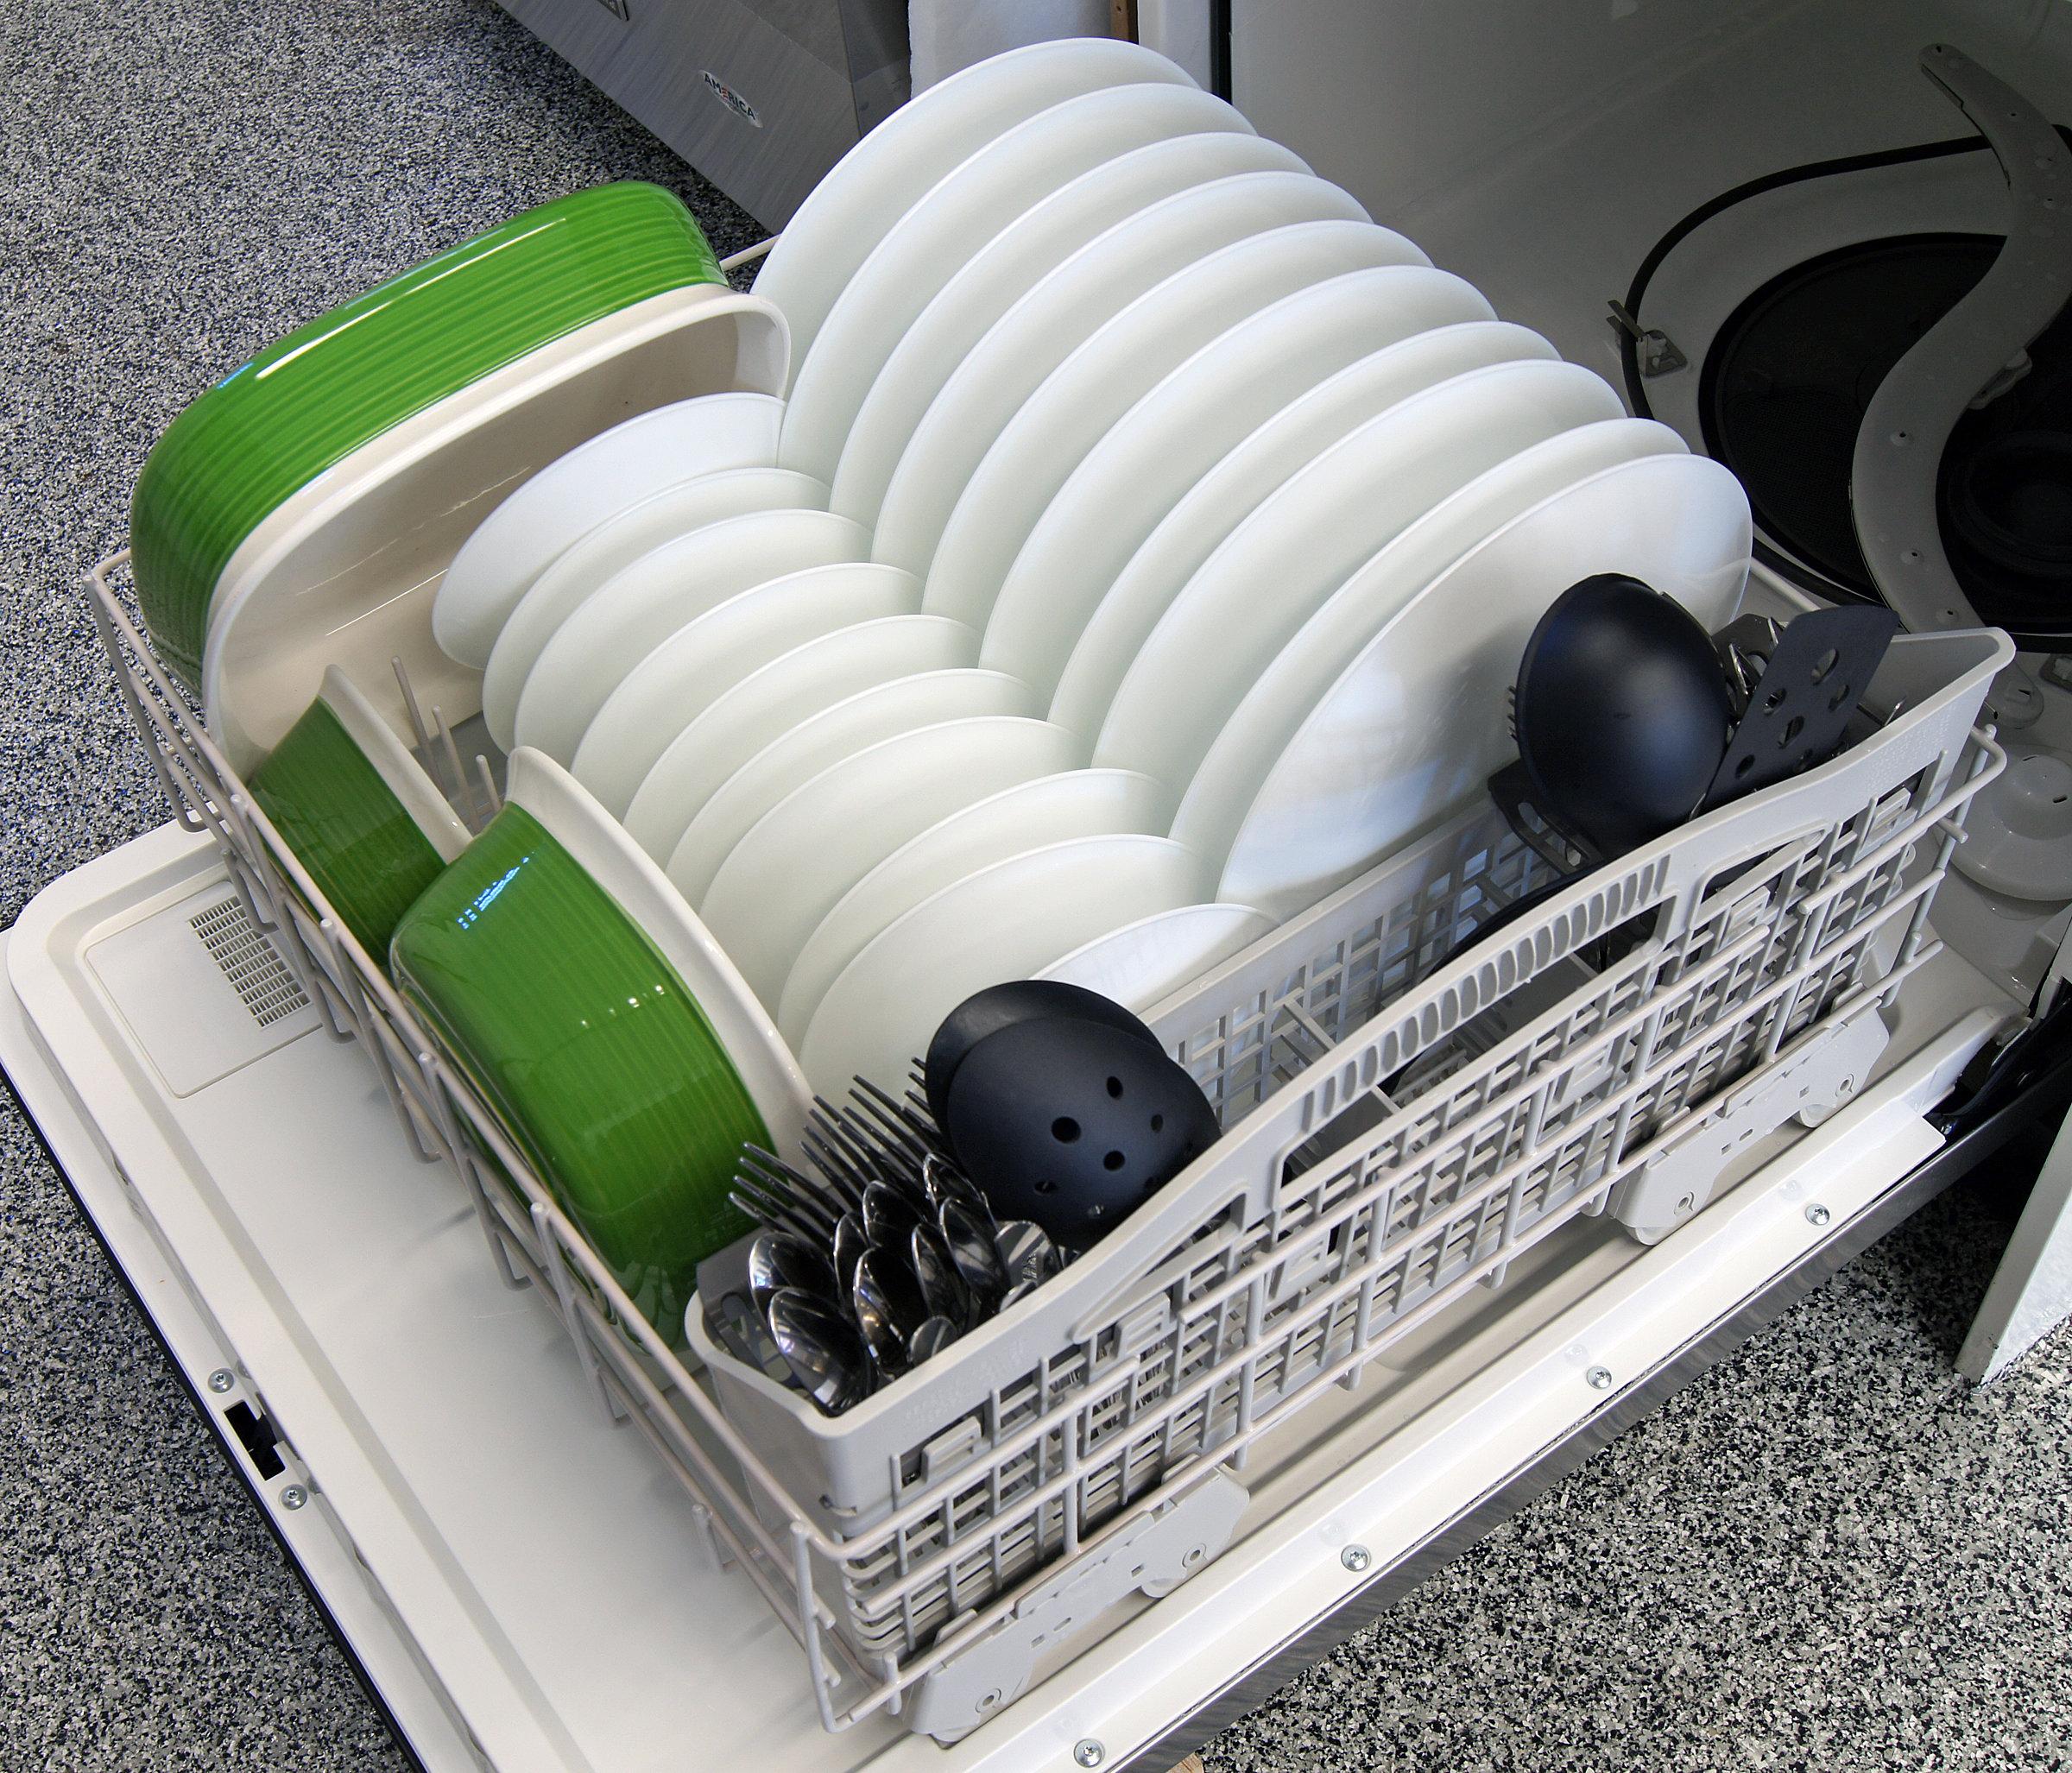 Kenmore 15113 bottom rack capacity